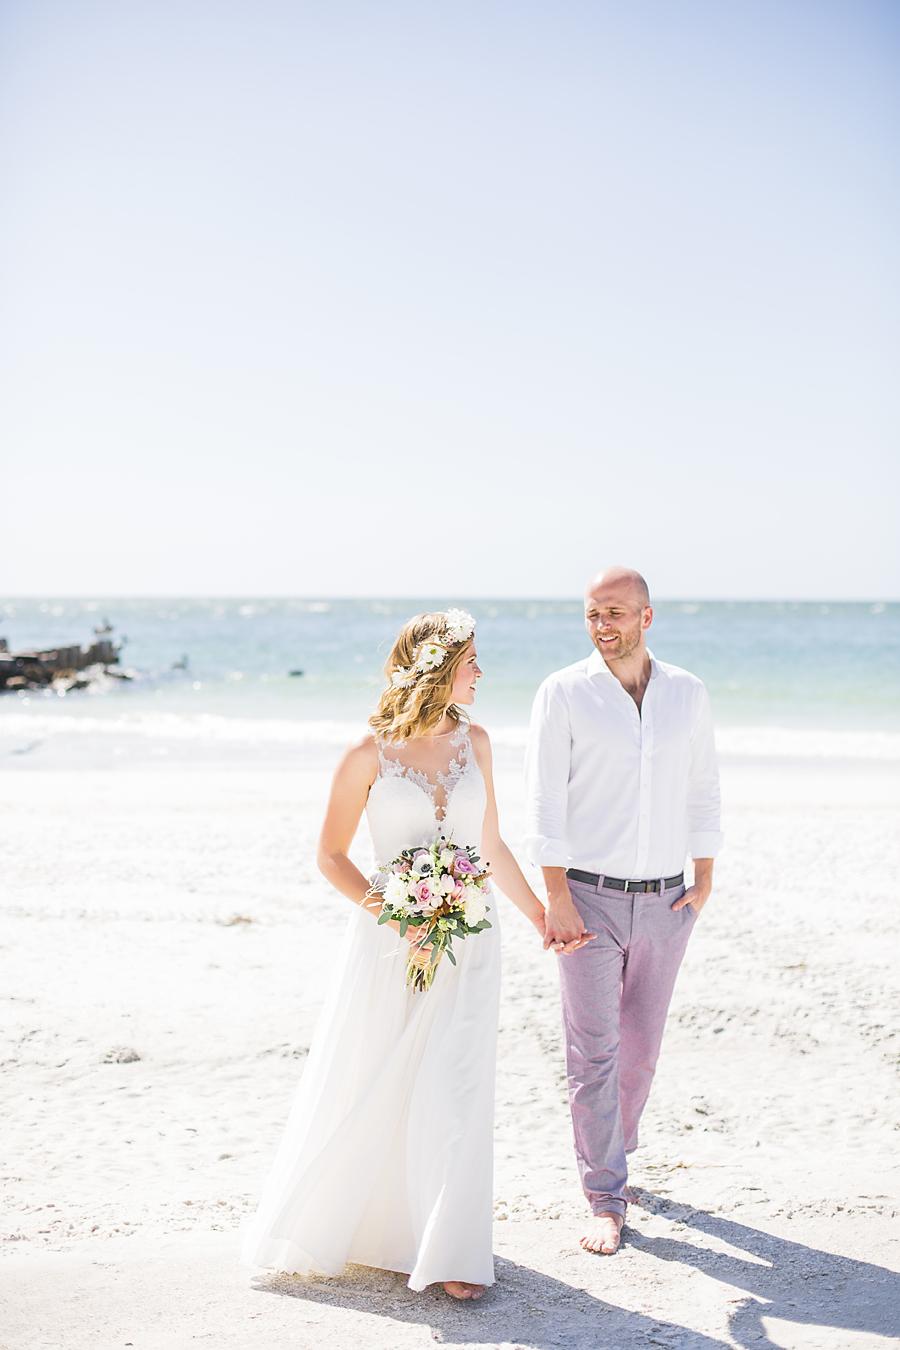 Luise + Daniel - Anna Maria Island Wedding Photography - Emily & Co 1.jpg